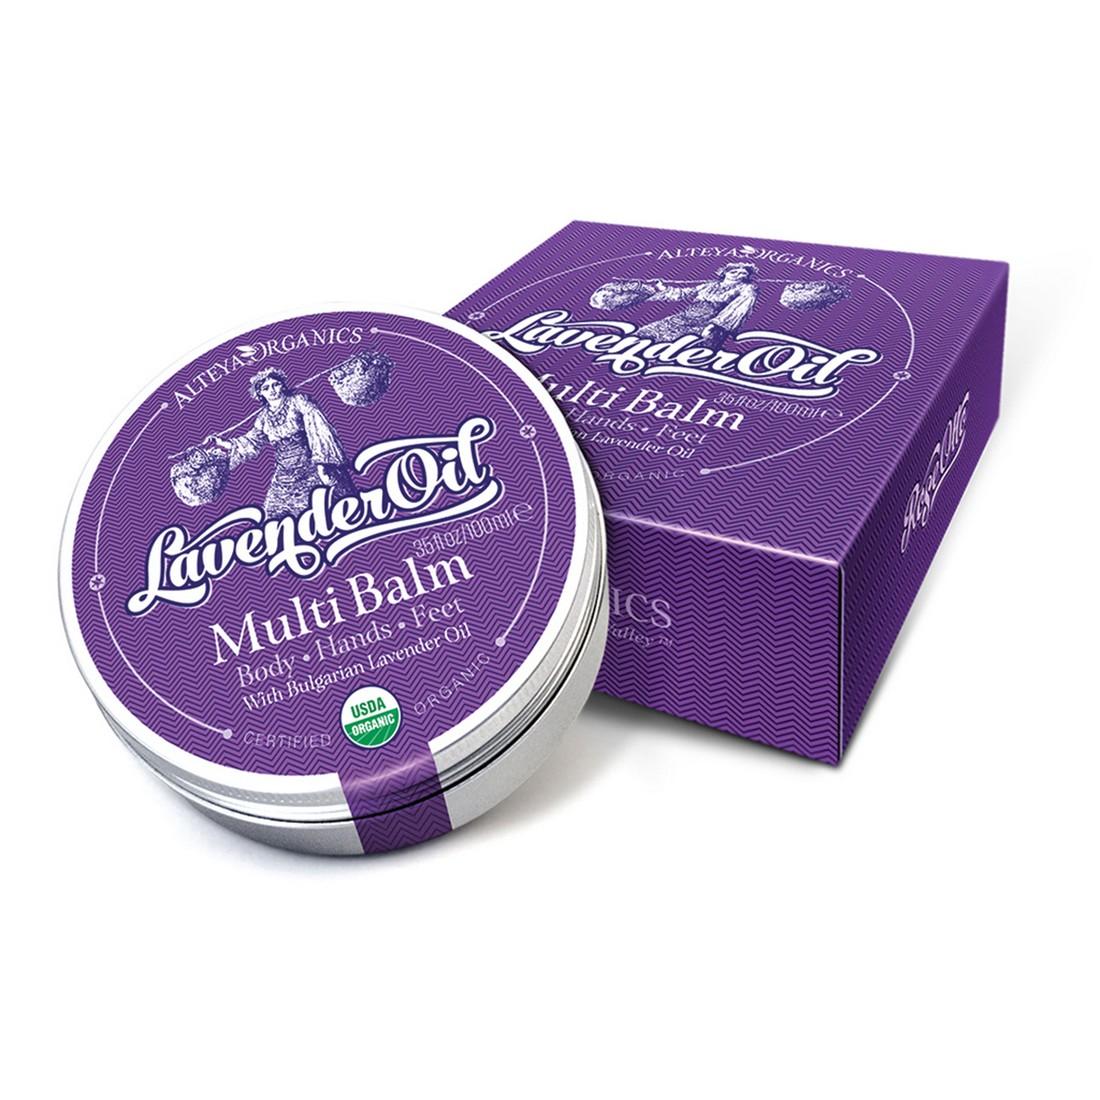 Bio оrganic universal balm with lavender 100 ml. Alteya Organics